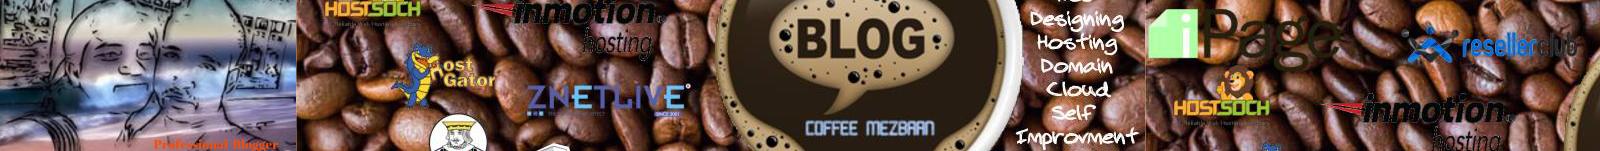 The Coffee Mezbaan